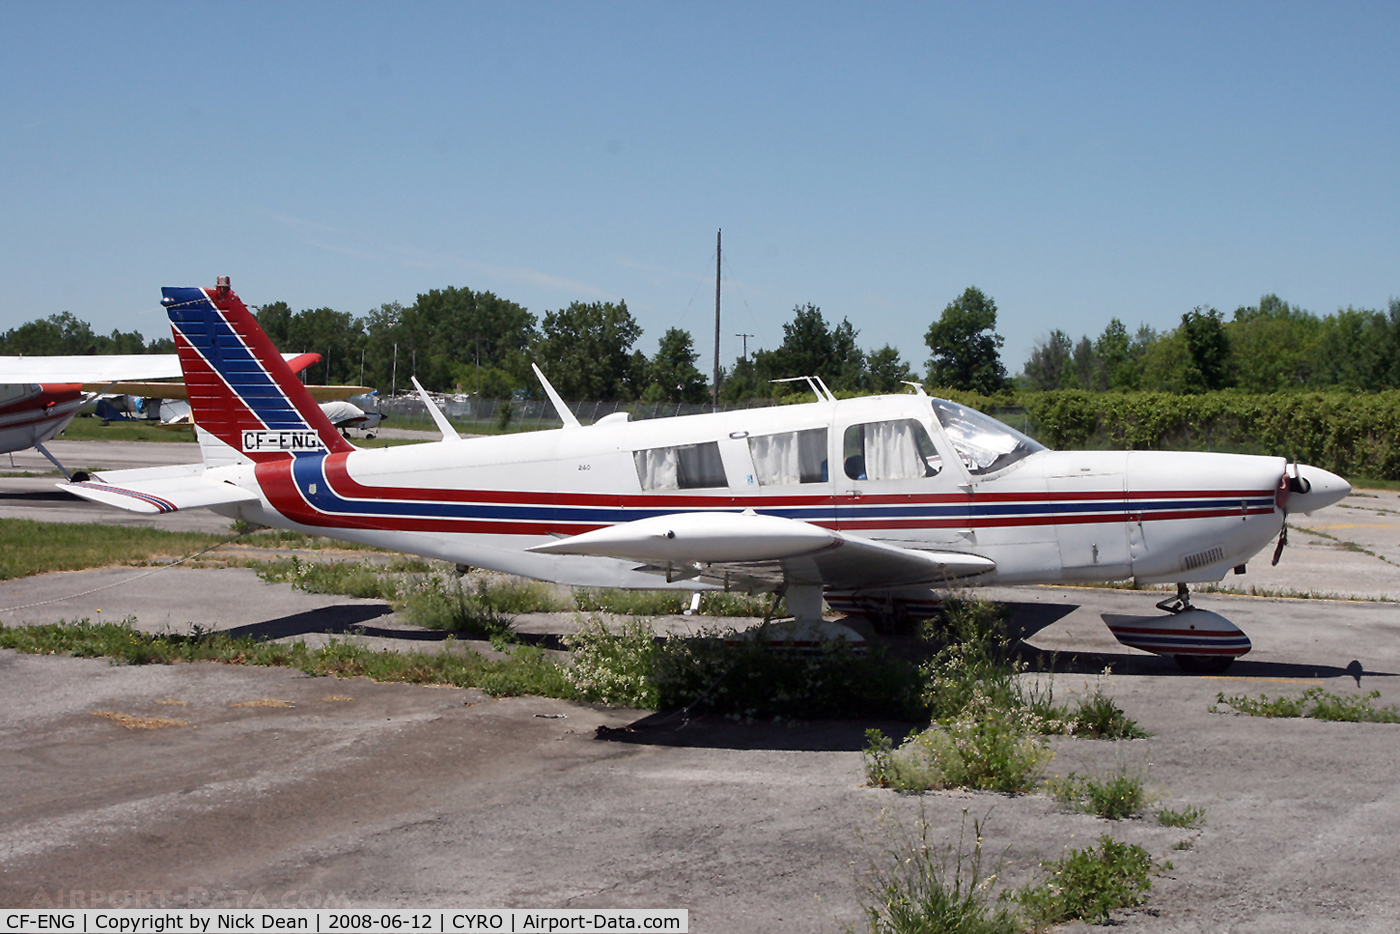 CF-ENG, 1966 Piper PA-32-260 C/N 32-675, /